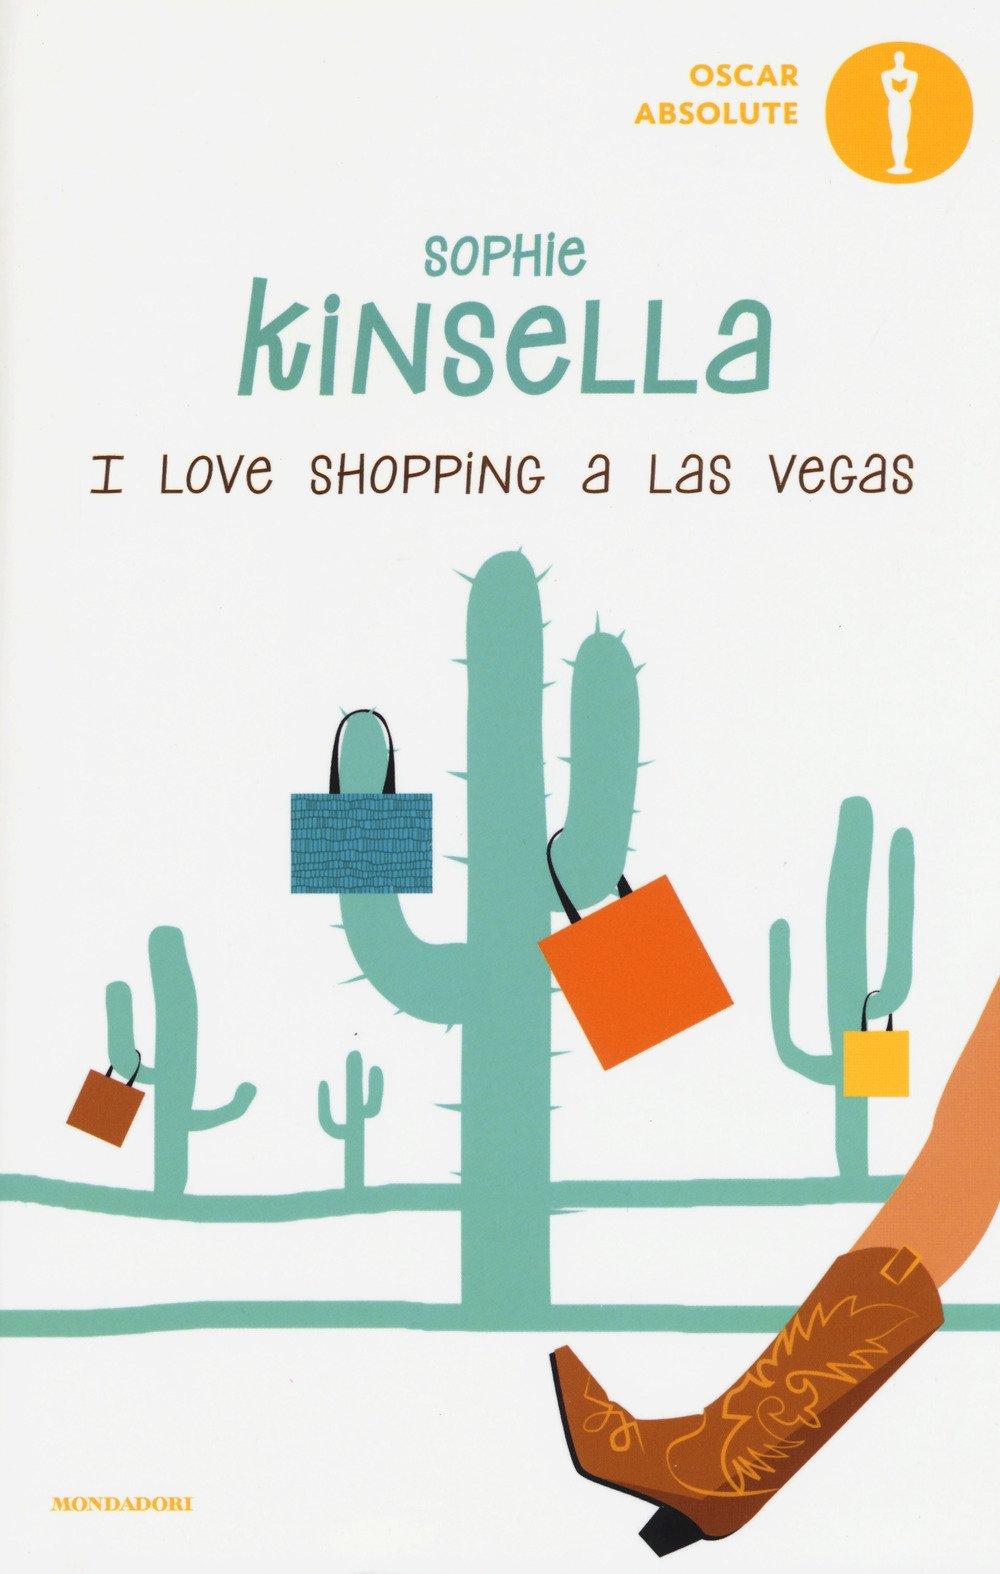 I love shopping a Las Vegas.